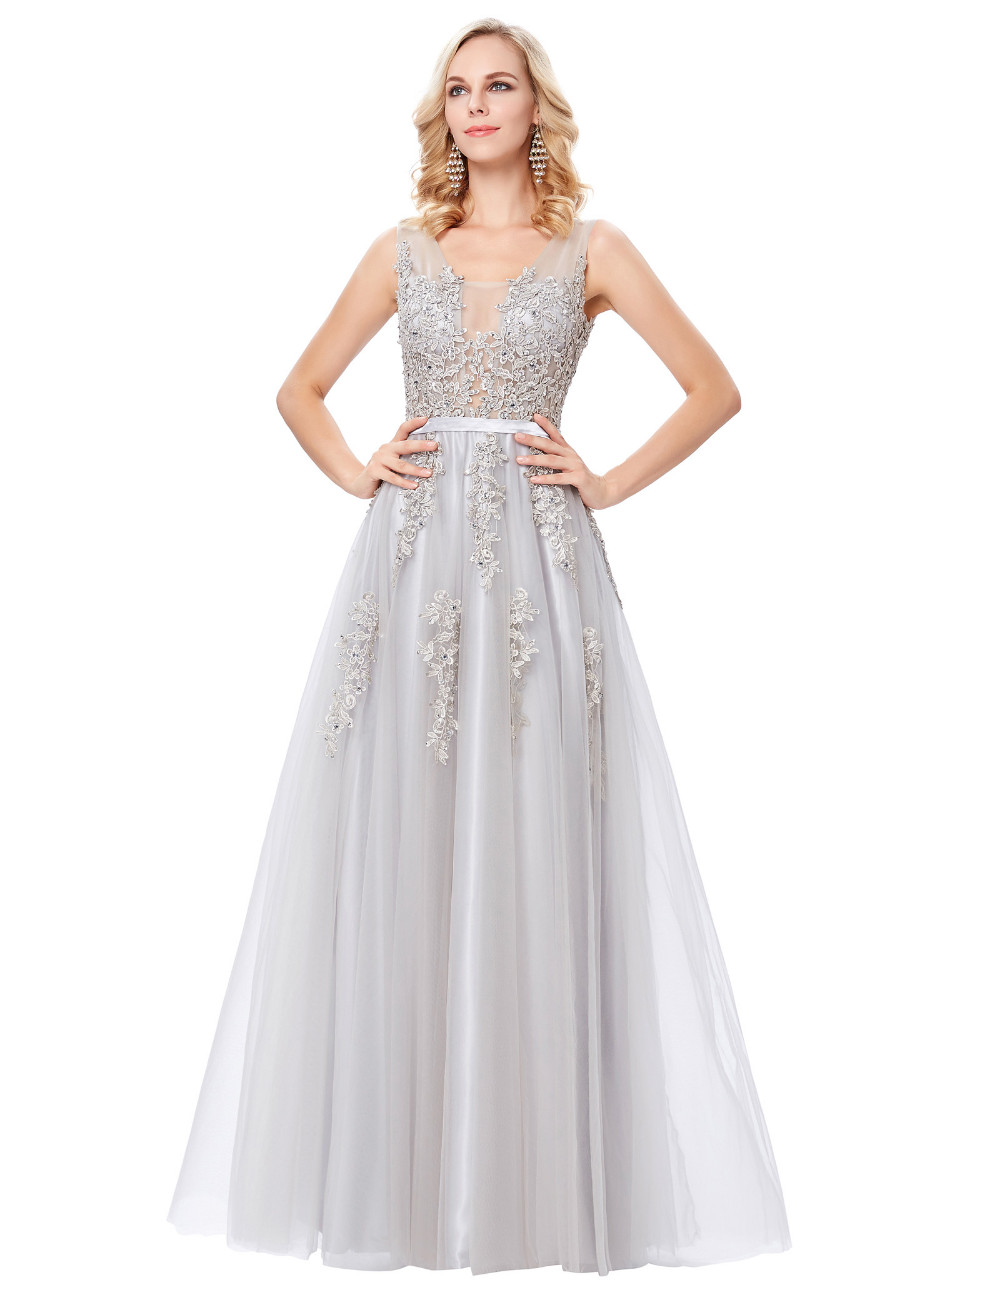 Grace Karin Tulle Appliques Celebrity Prom Dress Sexy V Back Sleeveless Long Royal Blue Robes De Soiree 2017 Longue Prom Dresses 23